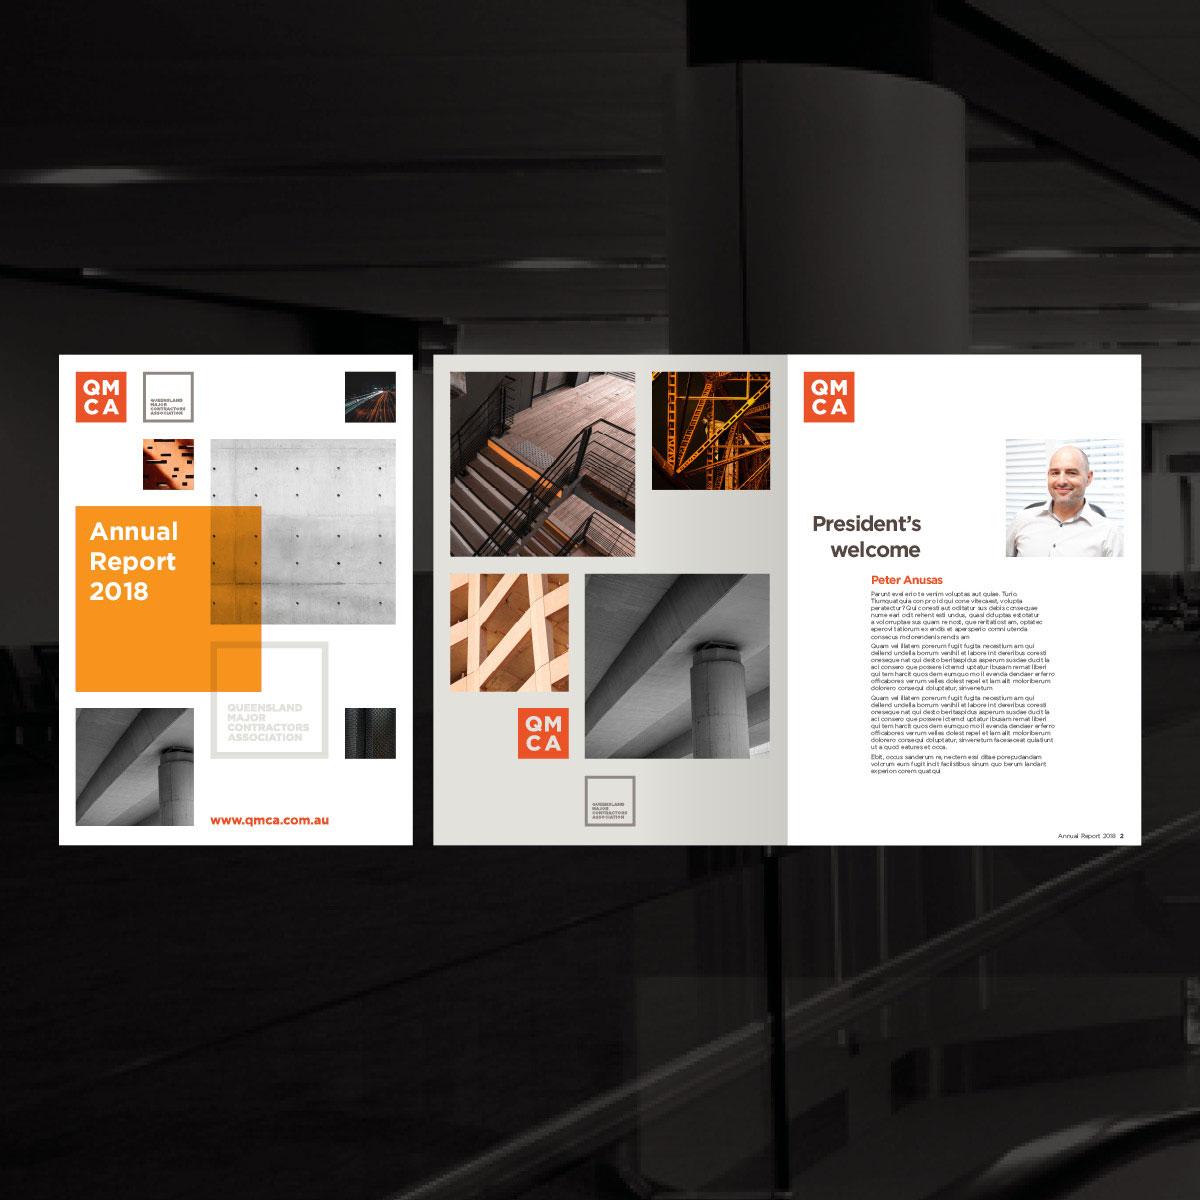 qmca-applications-1.jpg